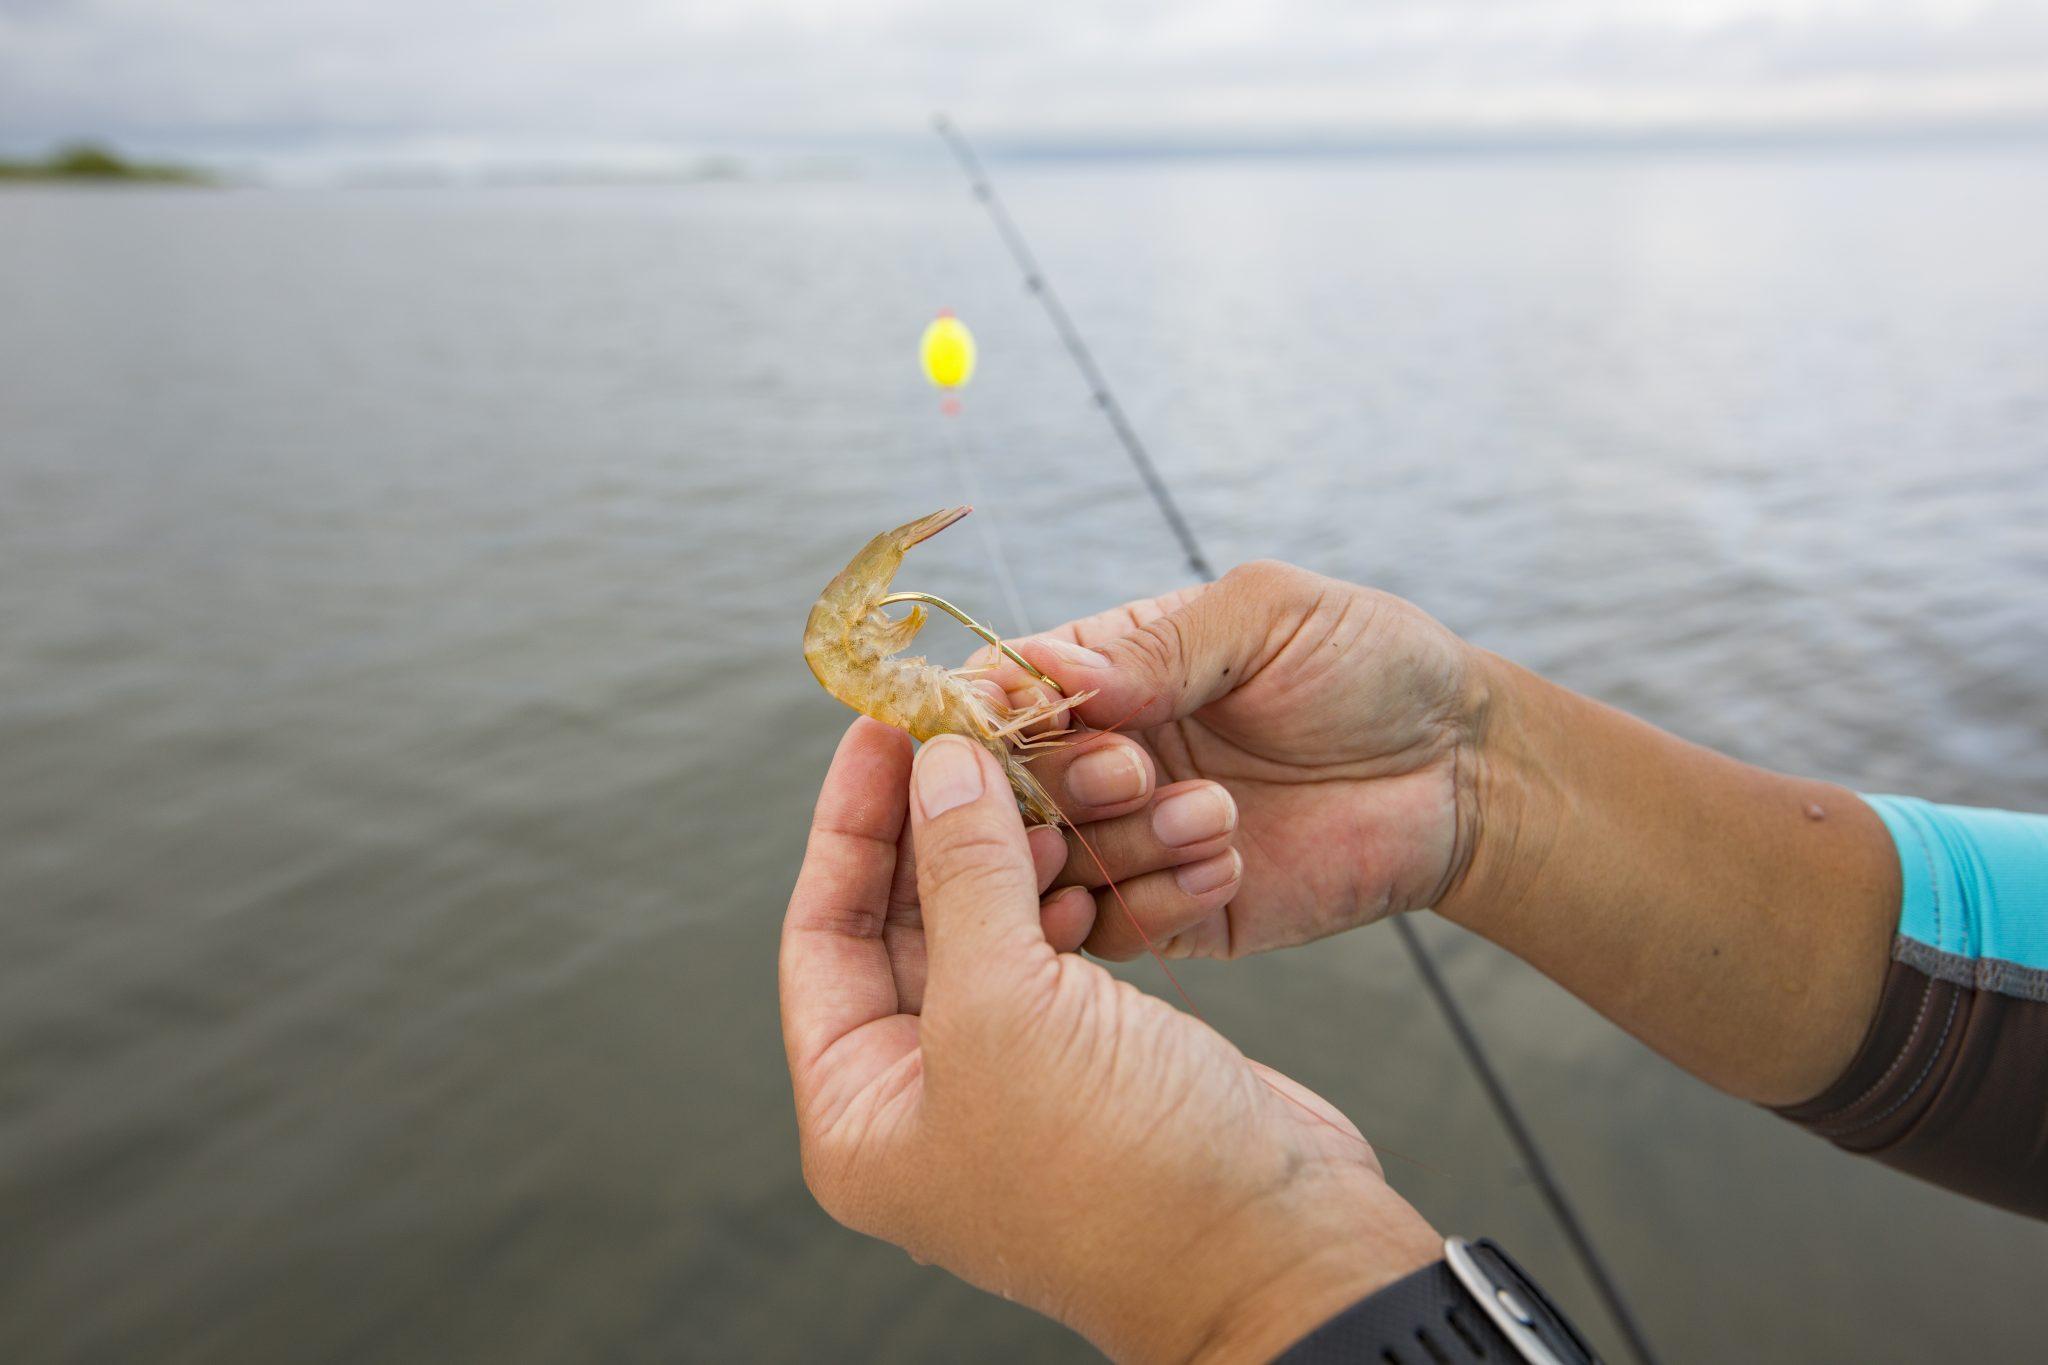 Hooking shrimp bait